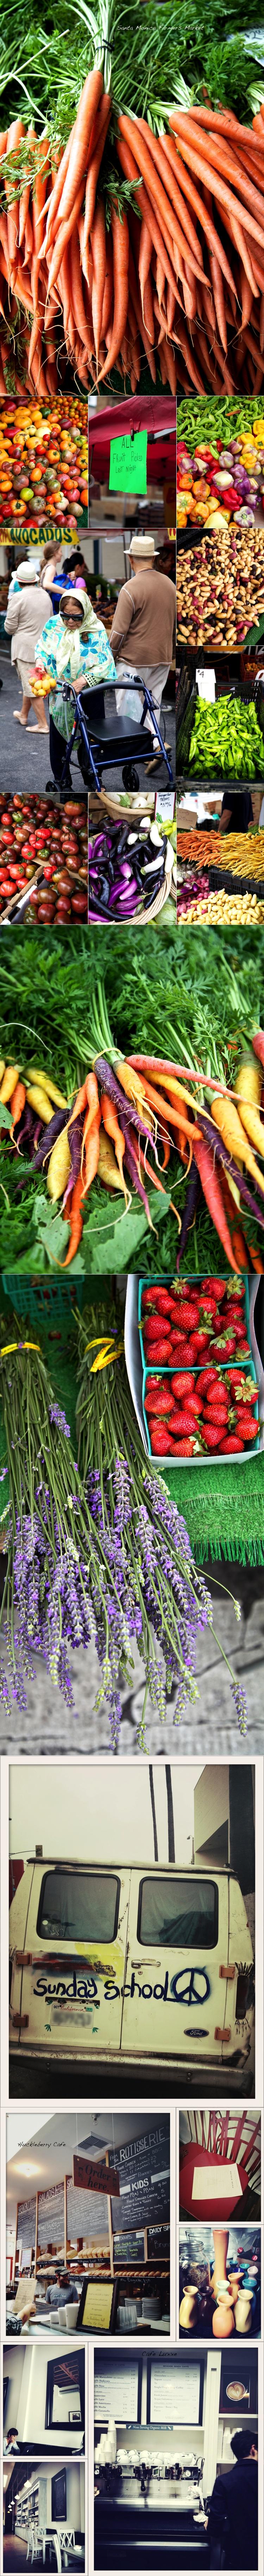 SM Farmers Market